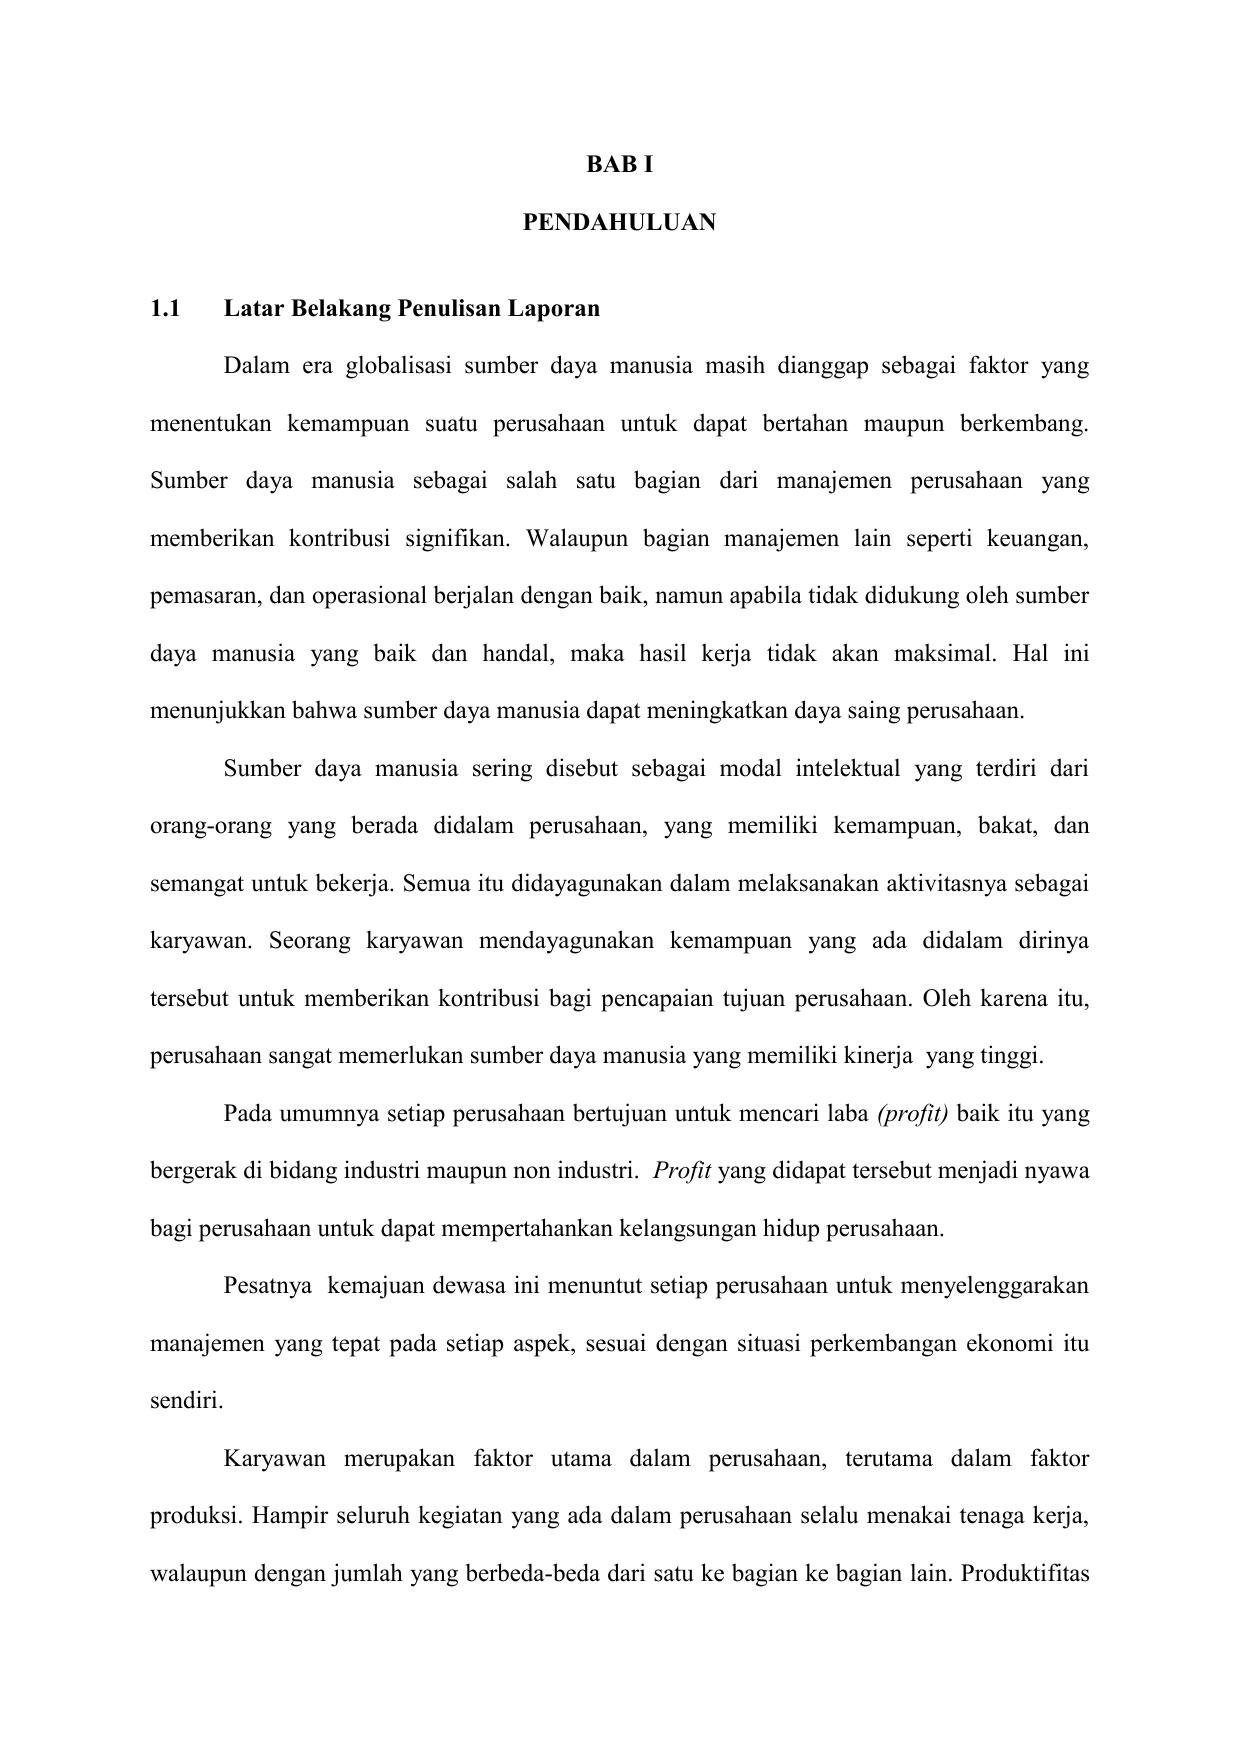 Bab I Pendahuluan 1 1 Latar Belakang Penulisan Laporan